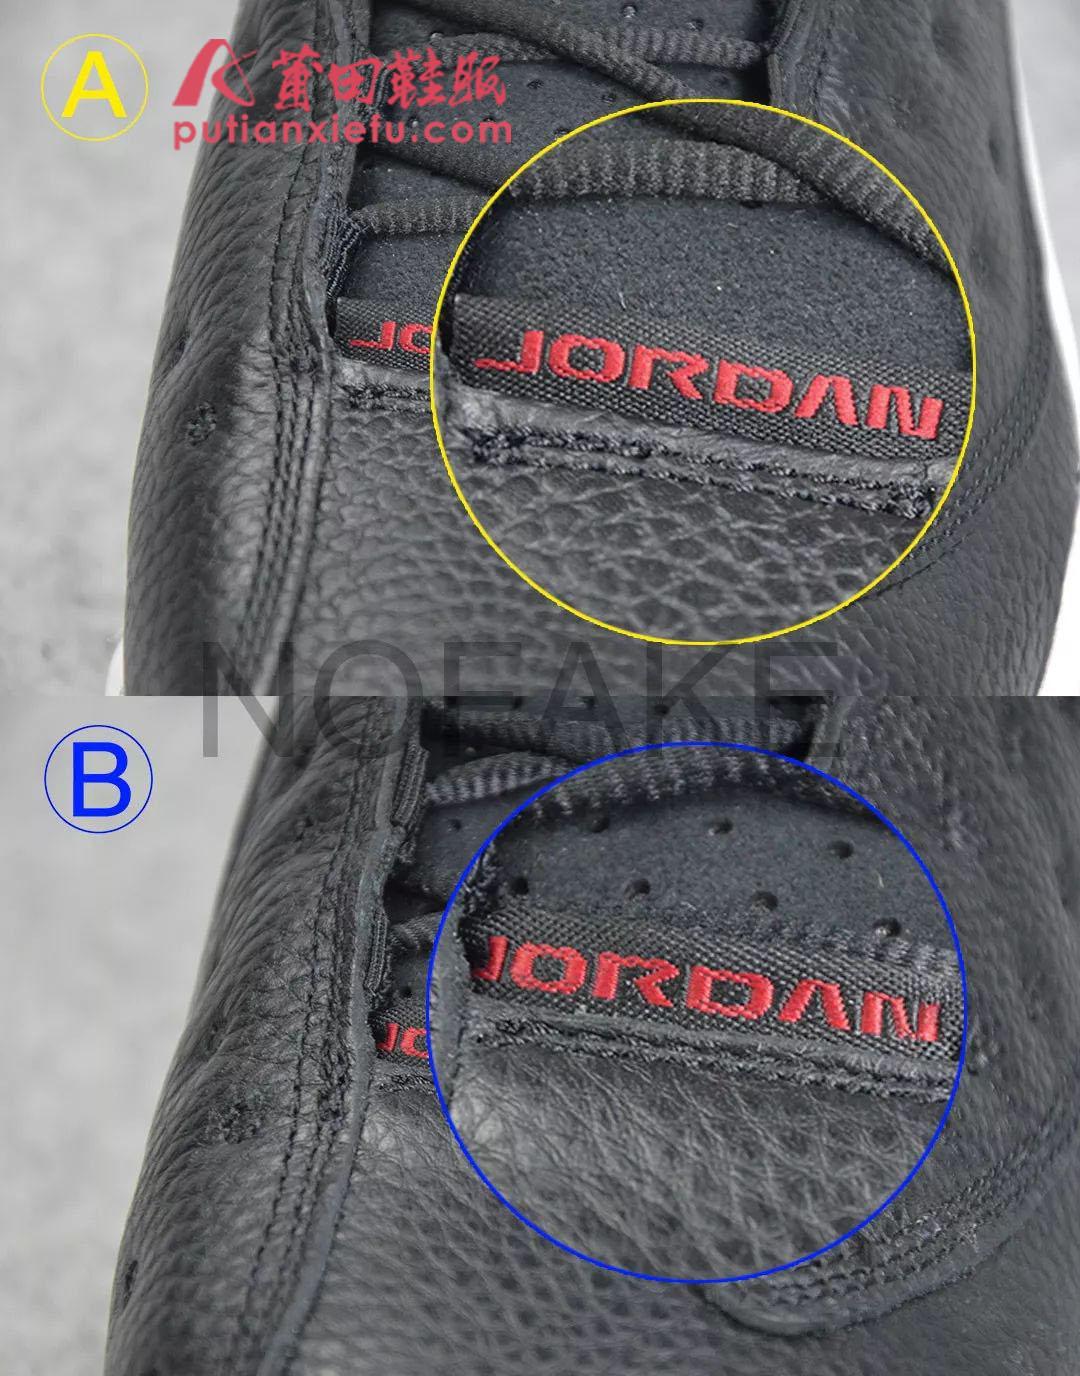 Air Jordan 13 Reverse He Got Game 反转熊猫 真假对比